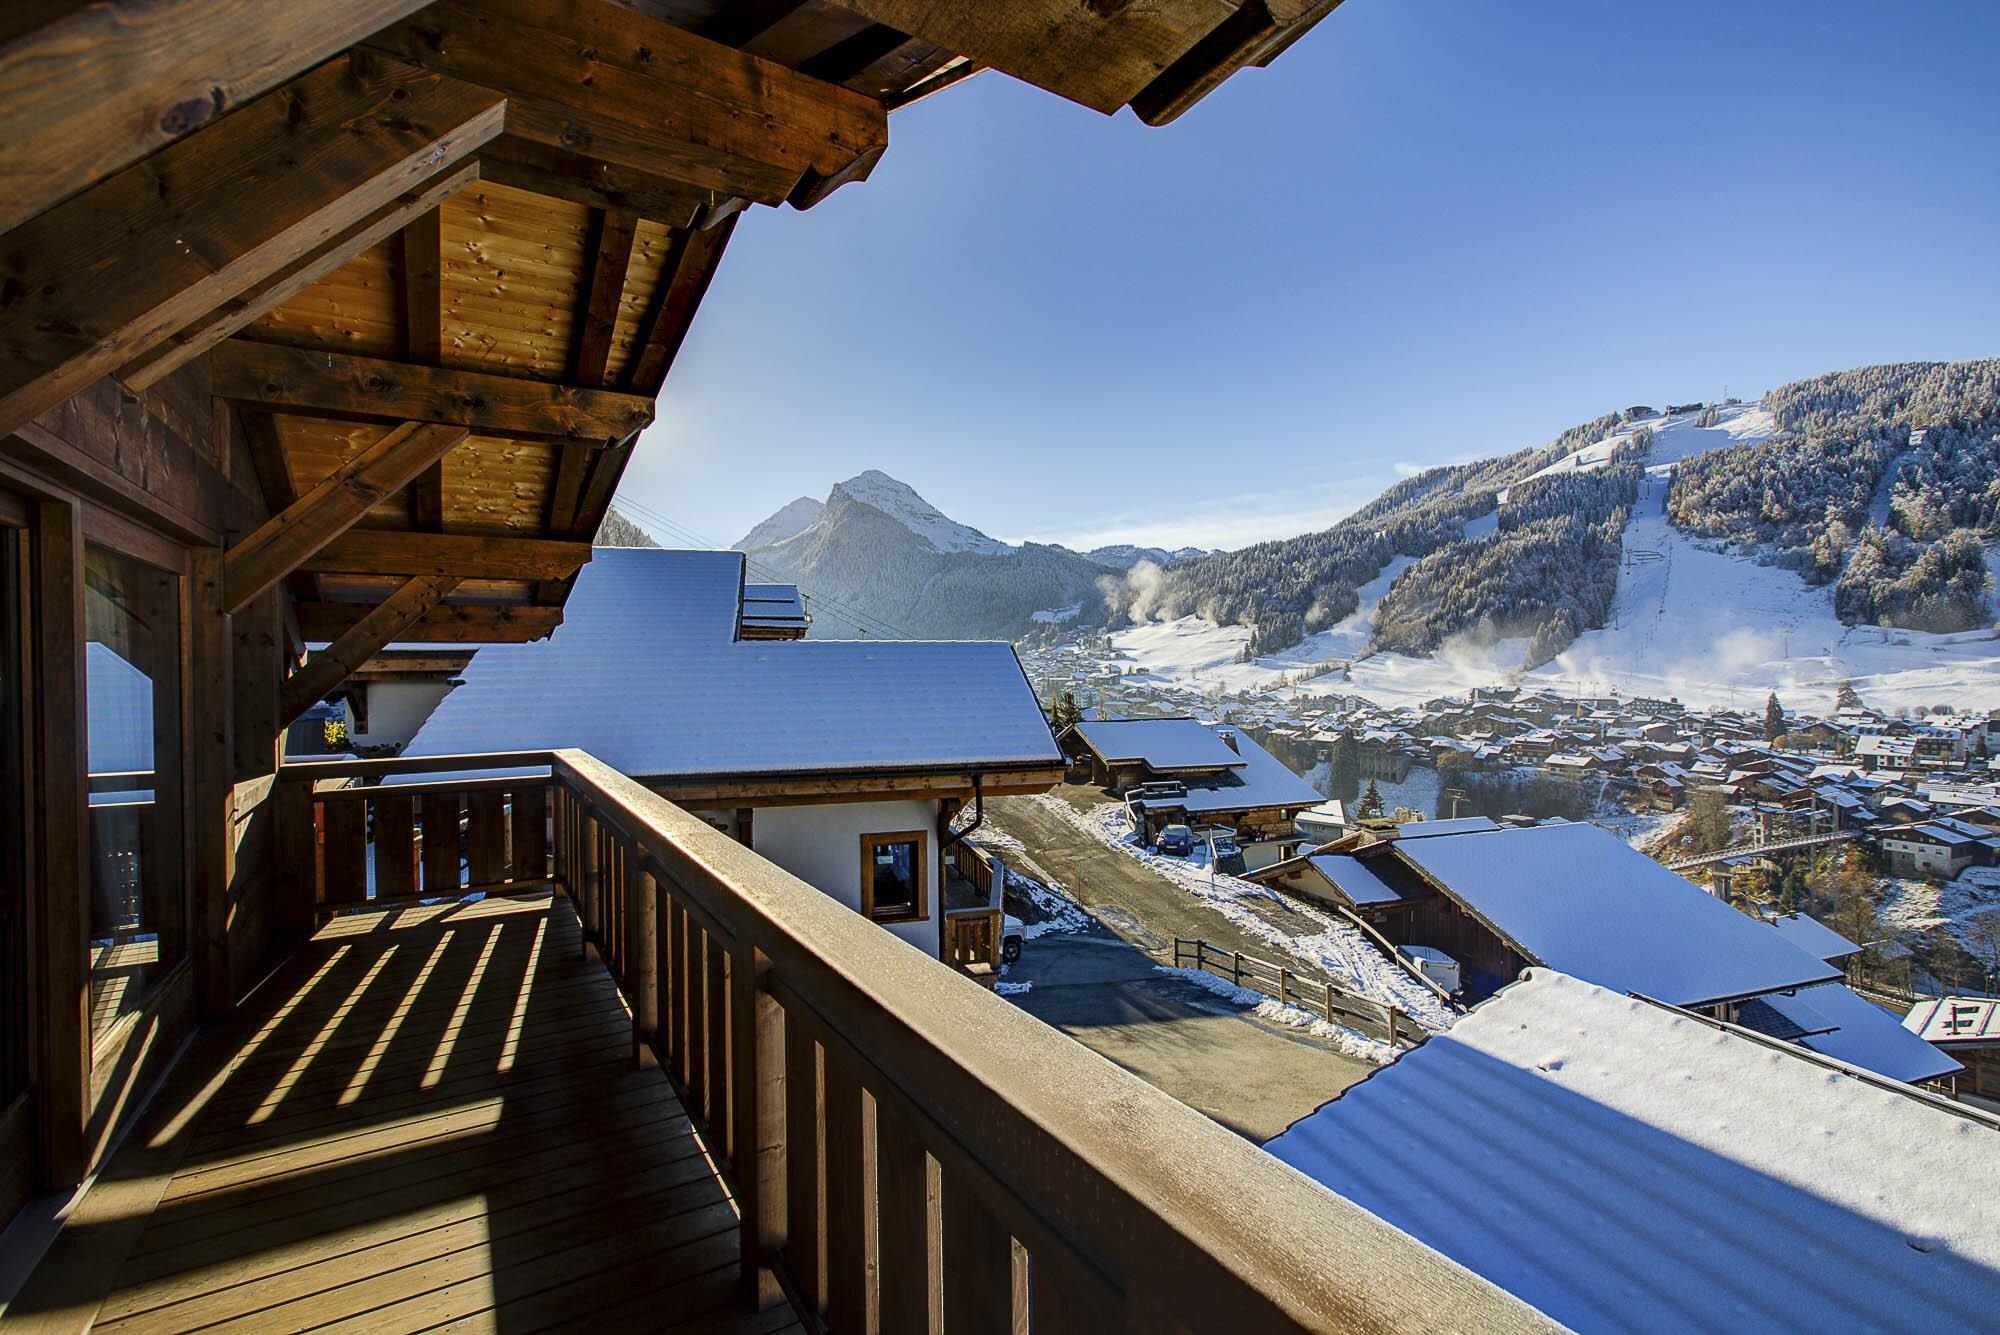 tg-ski-luxury-chalet-bouquetin-morzine-001.jpg